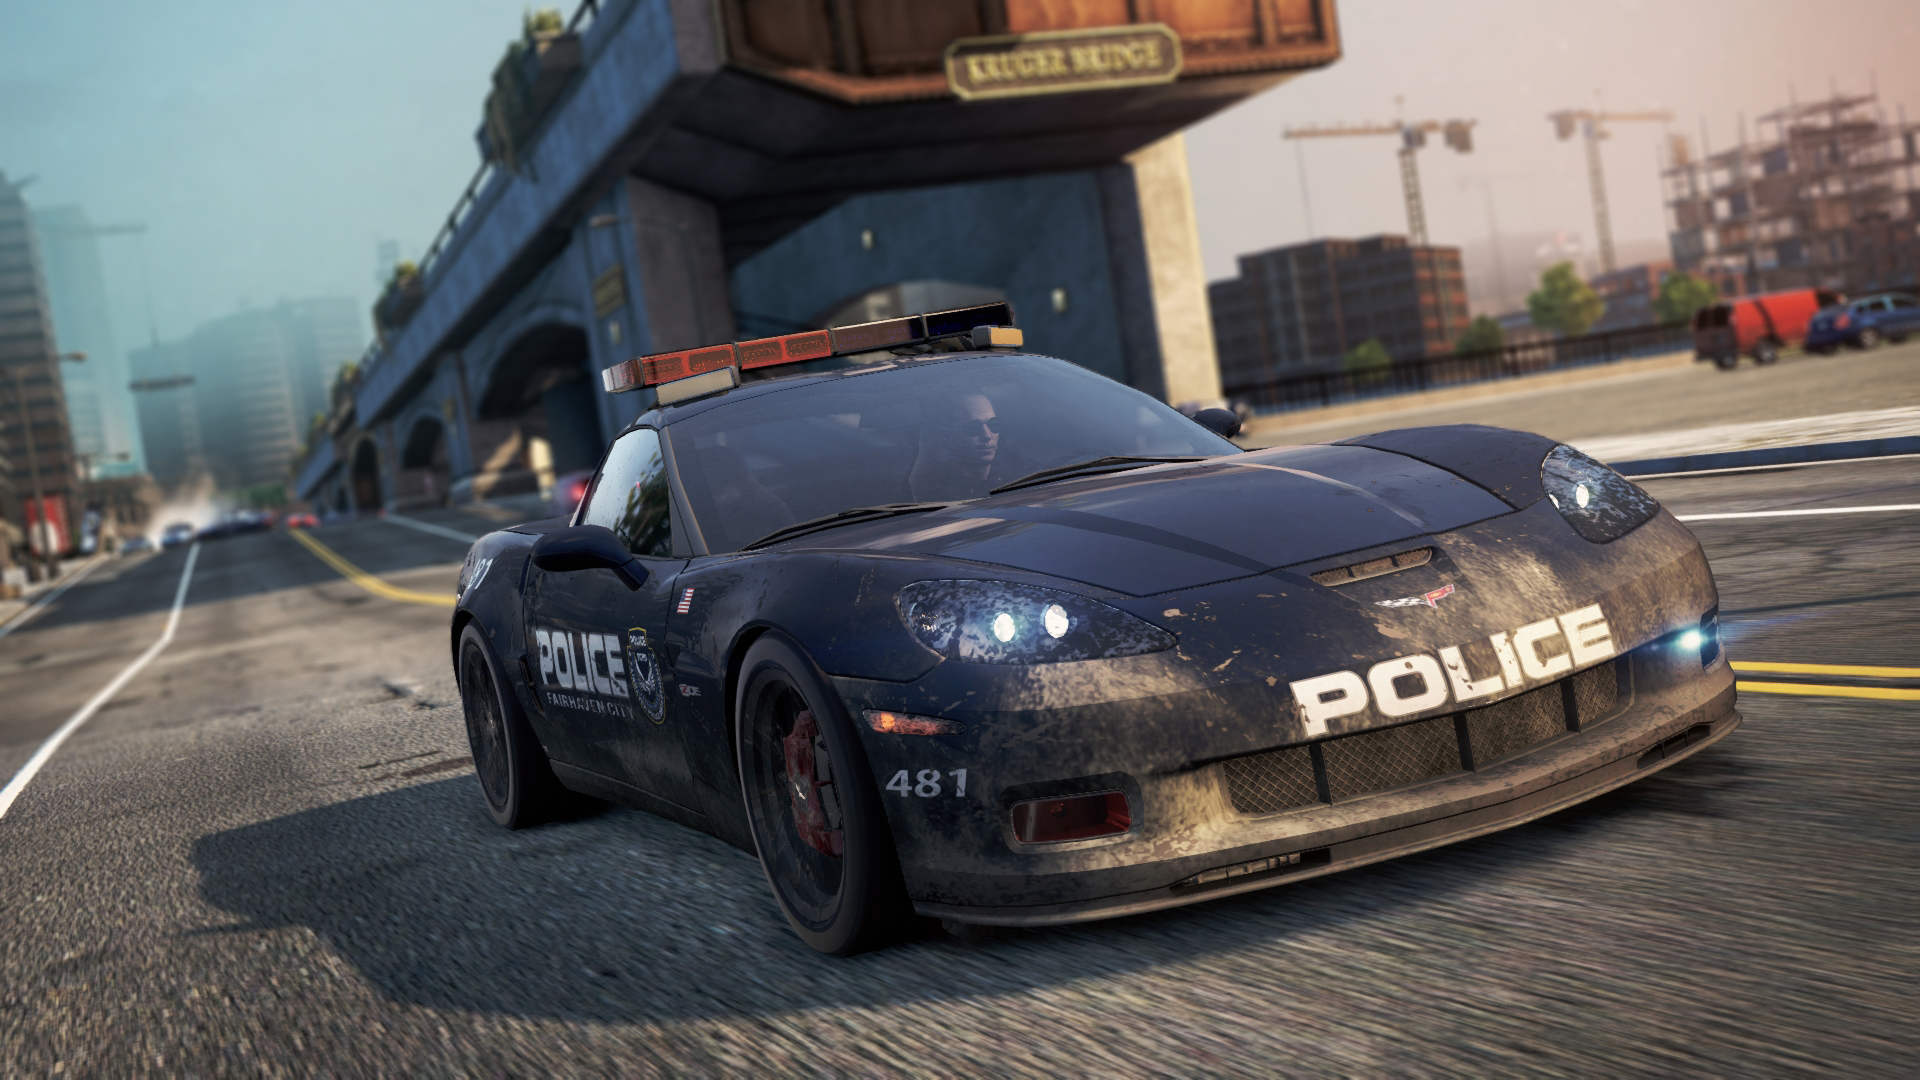 Corvette Police Car: Fairhaven City Police Department